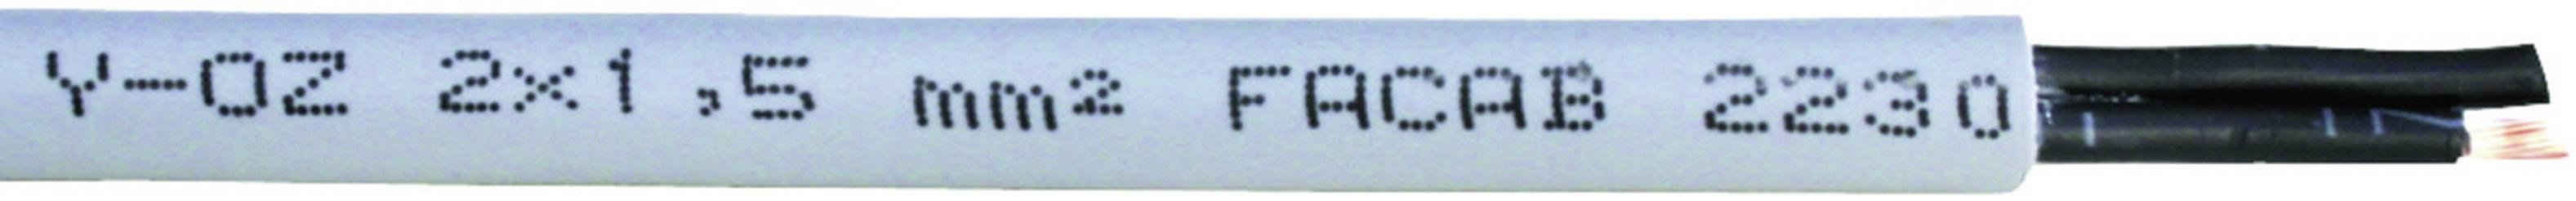 Riadiaci kábel Faber Kabel YSLY-OZ 030103, 2 x 0.75 mm², vonkajší Ø 5.40 mm, 500 V, metrový tovar, sivá